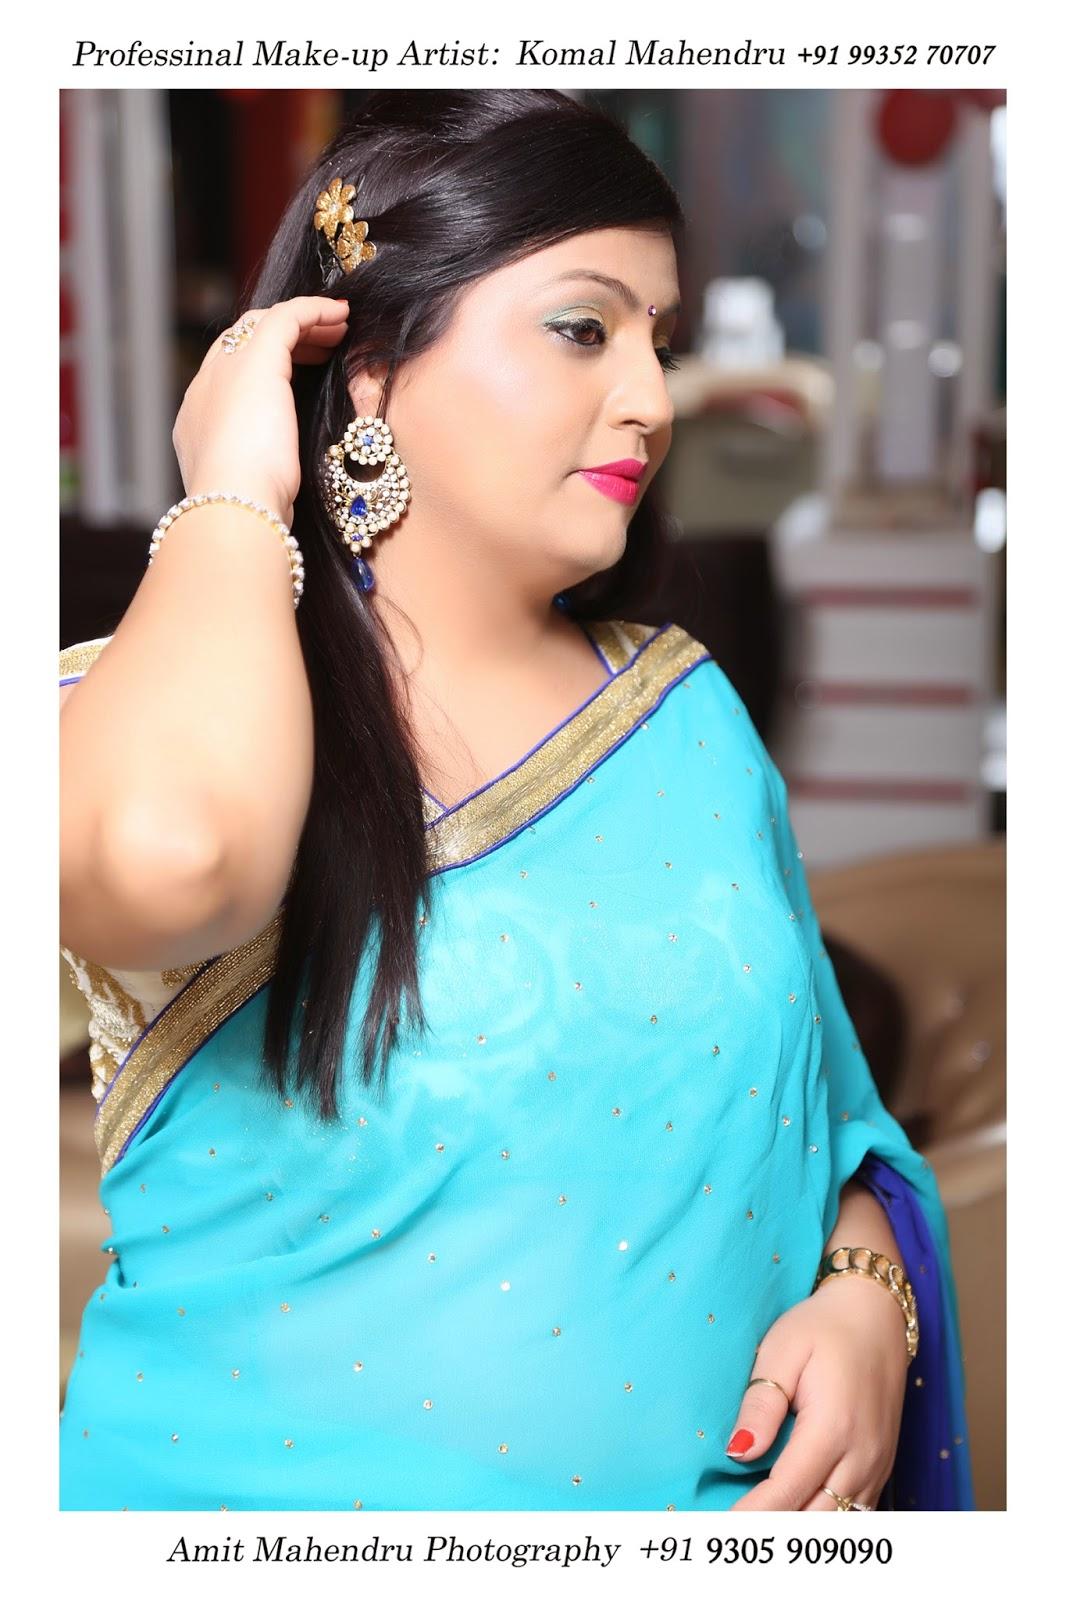 Komal mahendru s professional makeup lucknow india bridal makeup - Best Makeup Artist In Lucknow By Komal Mahendru